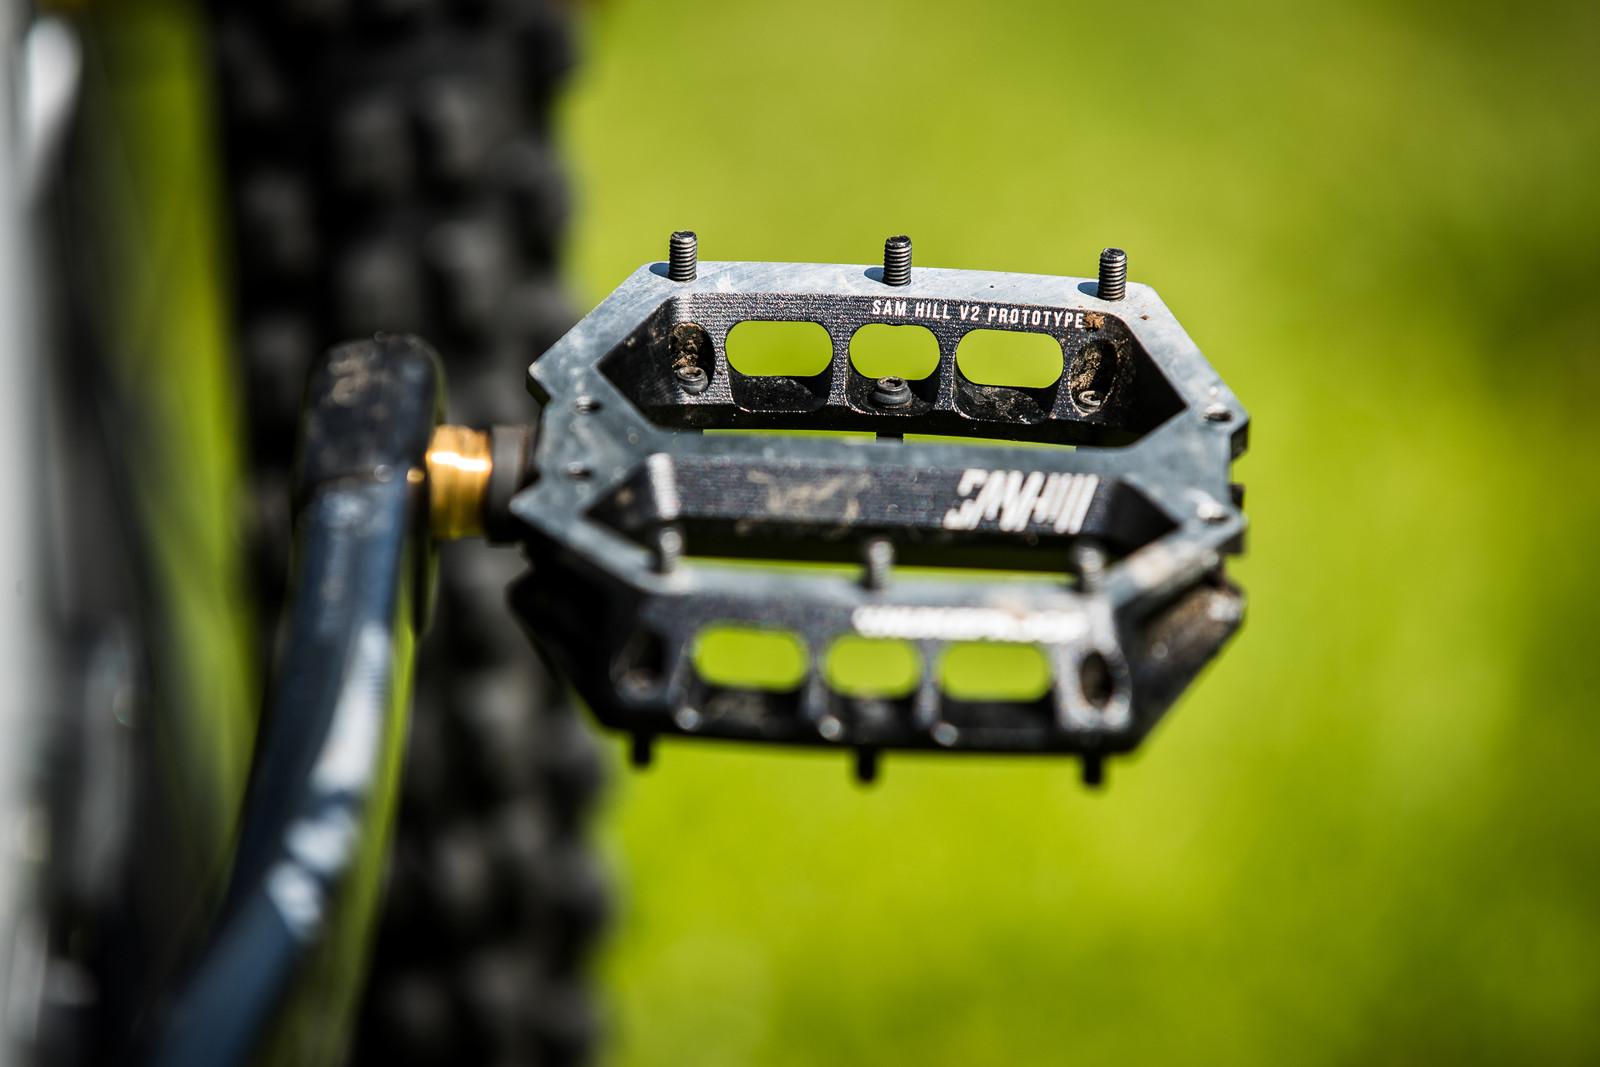 Prototype Nukeproof Flat Pedals - Sam Hill's Updated Prototype Nukeproof Mega 29 with SRAM AXS - Mountain Biking Pictures - Vital MTB